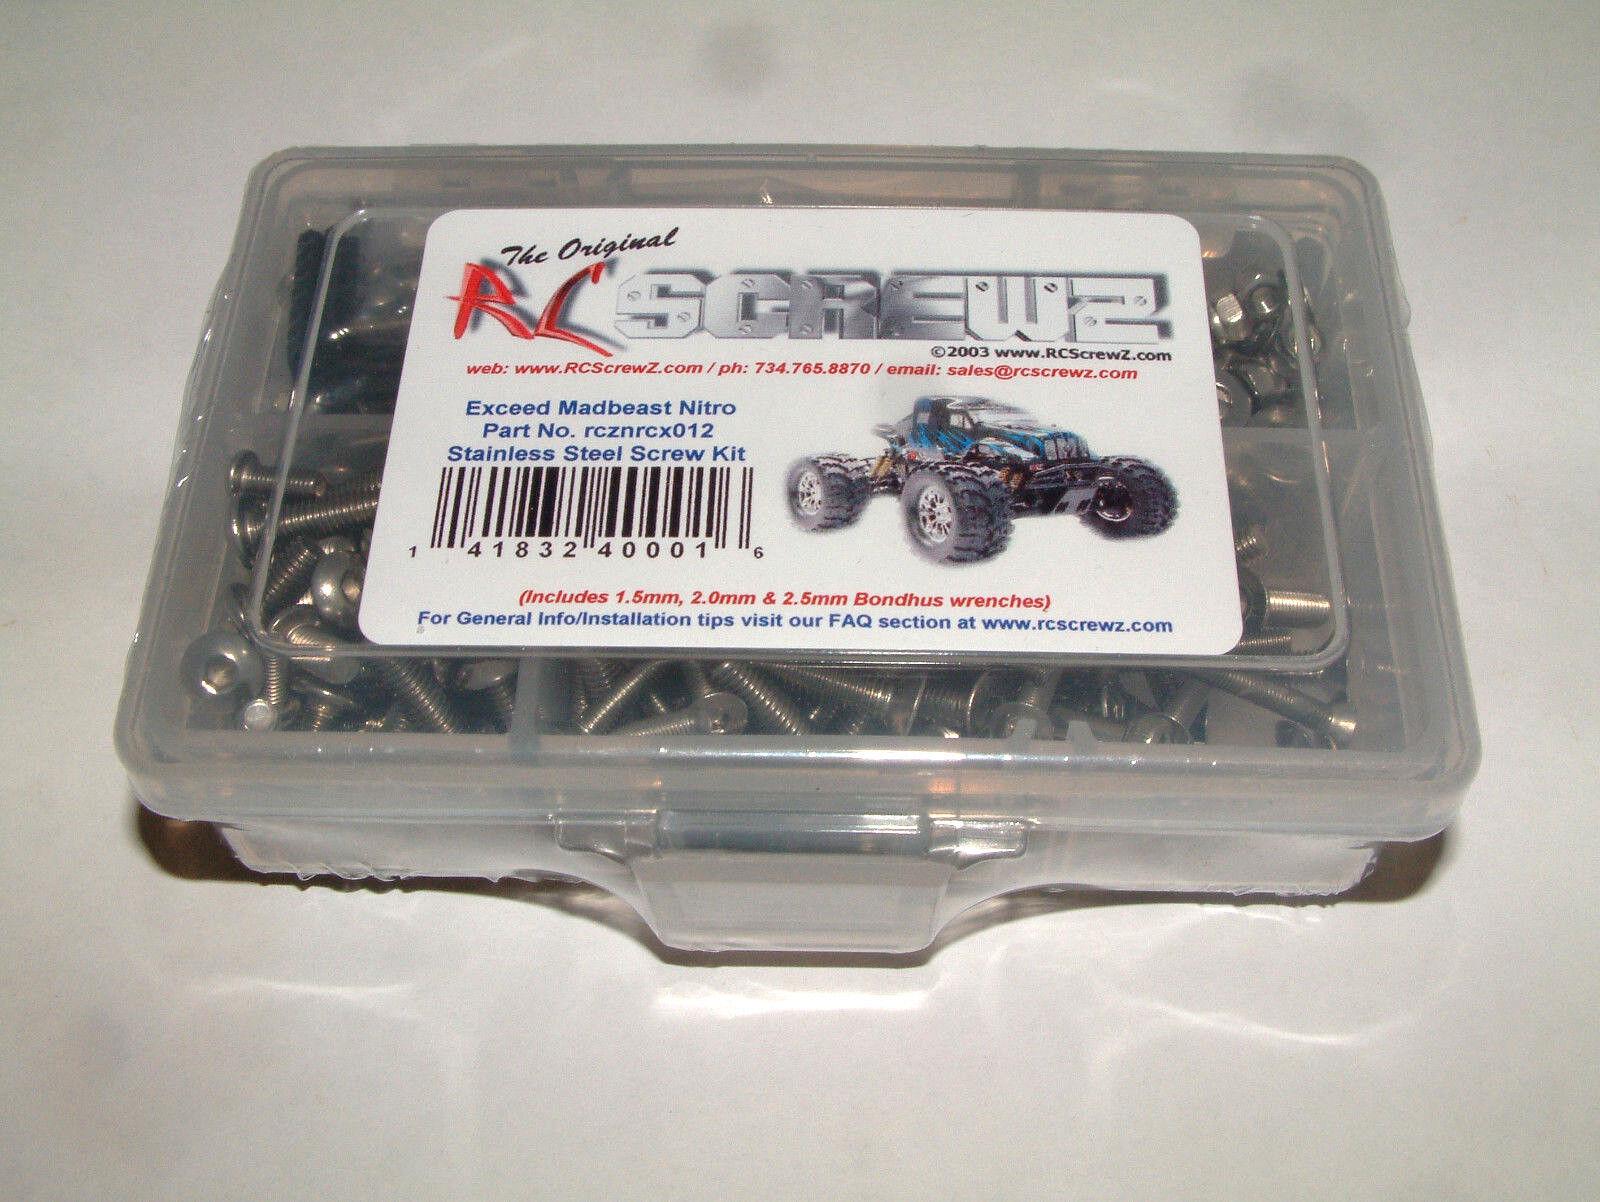 EXCEED MAD BEAST NITRO 1 7TH RC SCREWZ STAINLESS STEEL SCREW SET NRCX012